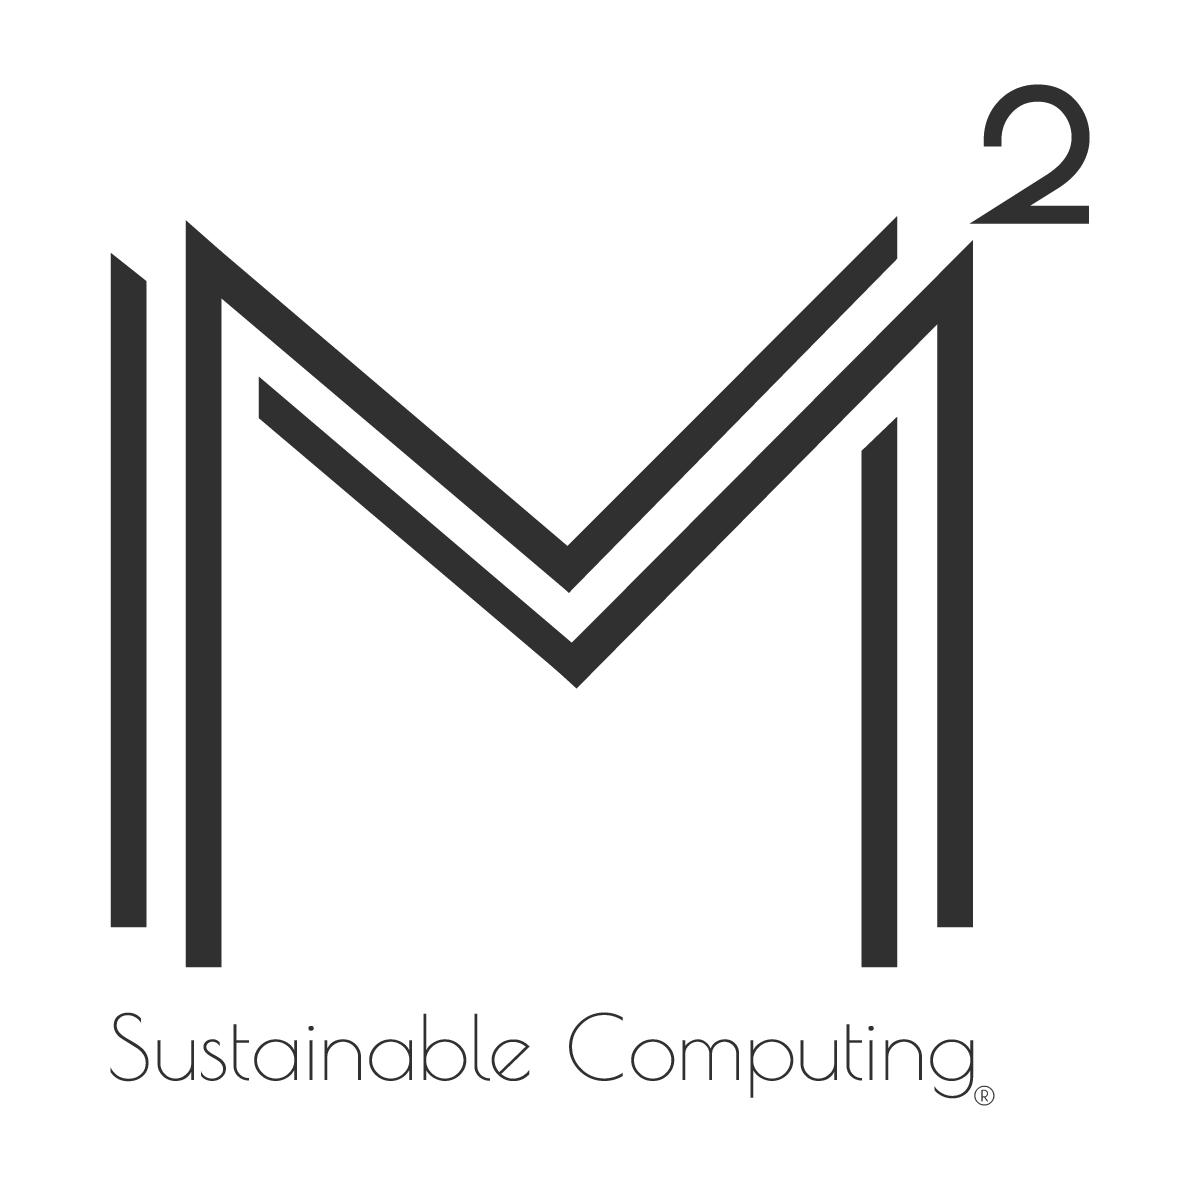 Logo M² définitif - JPG fond blanc - TYPO